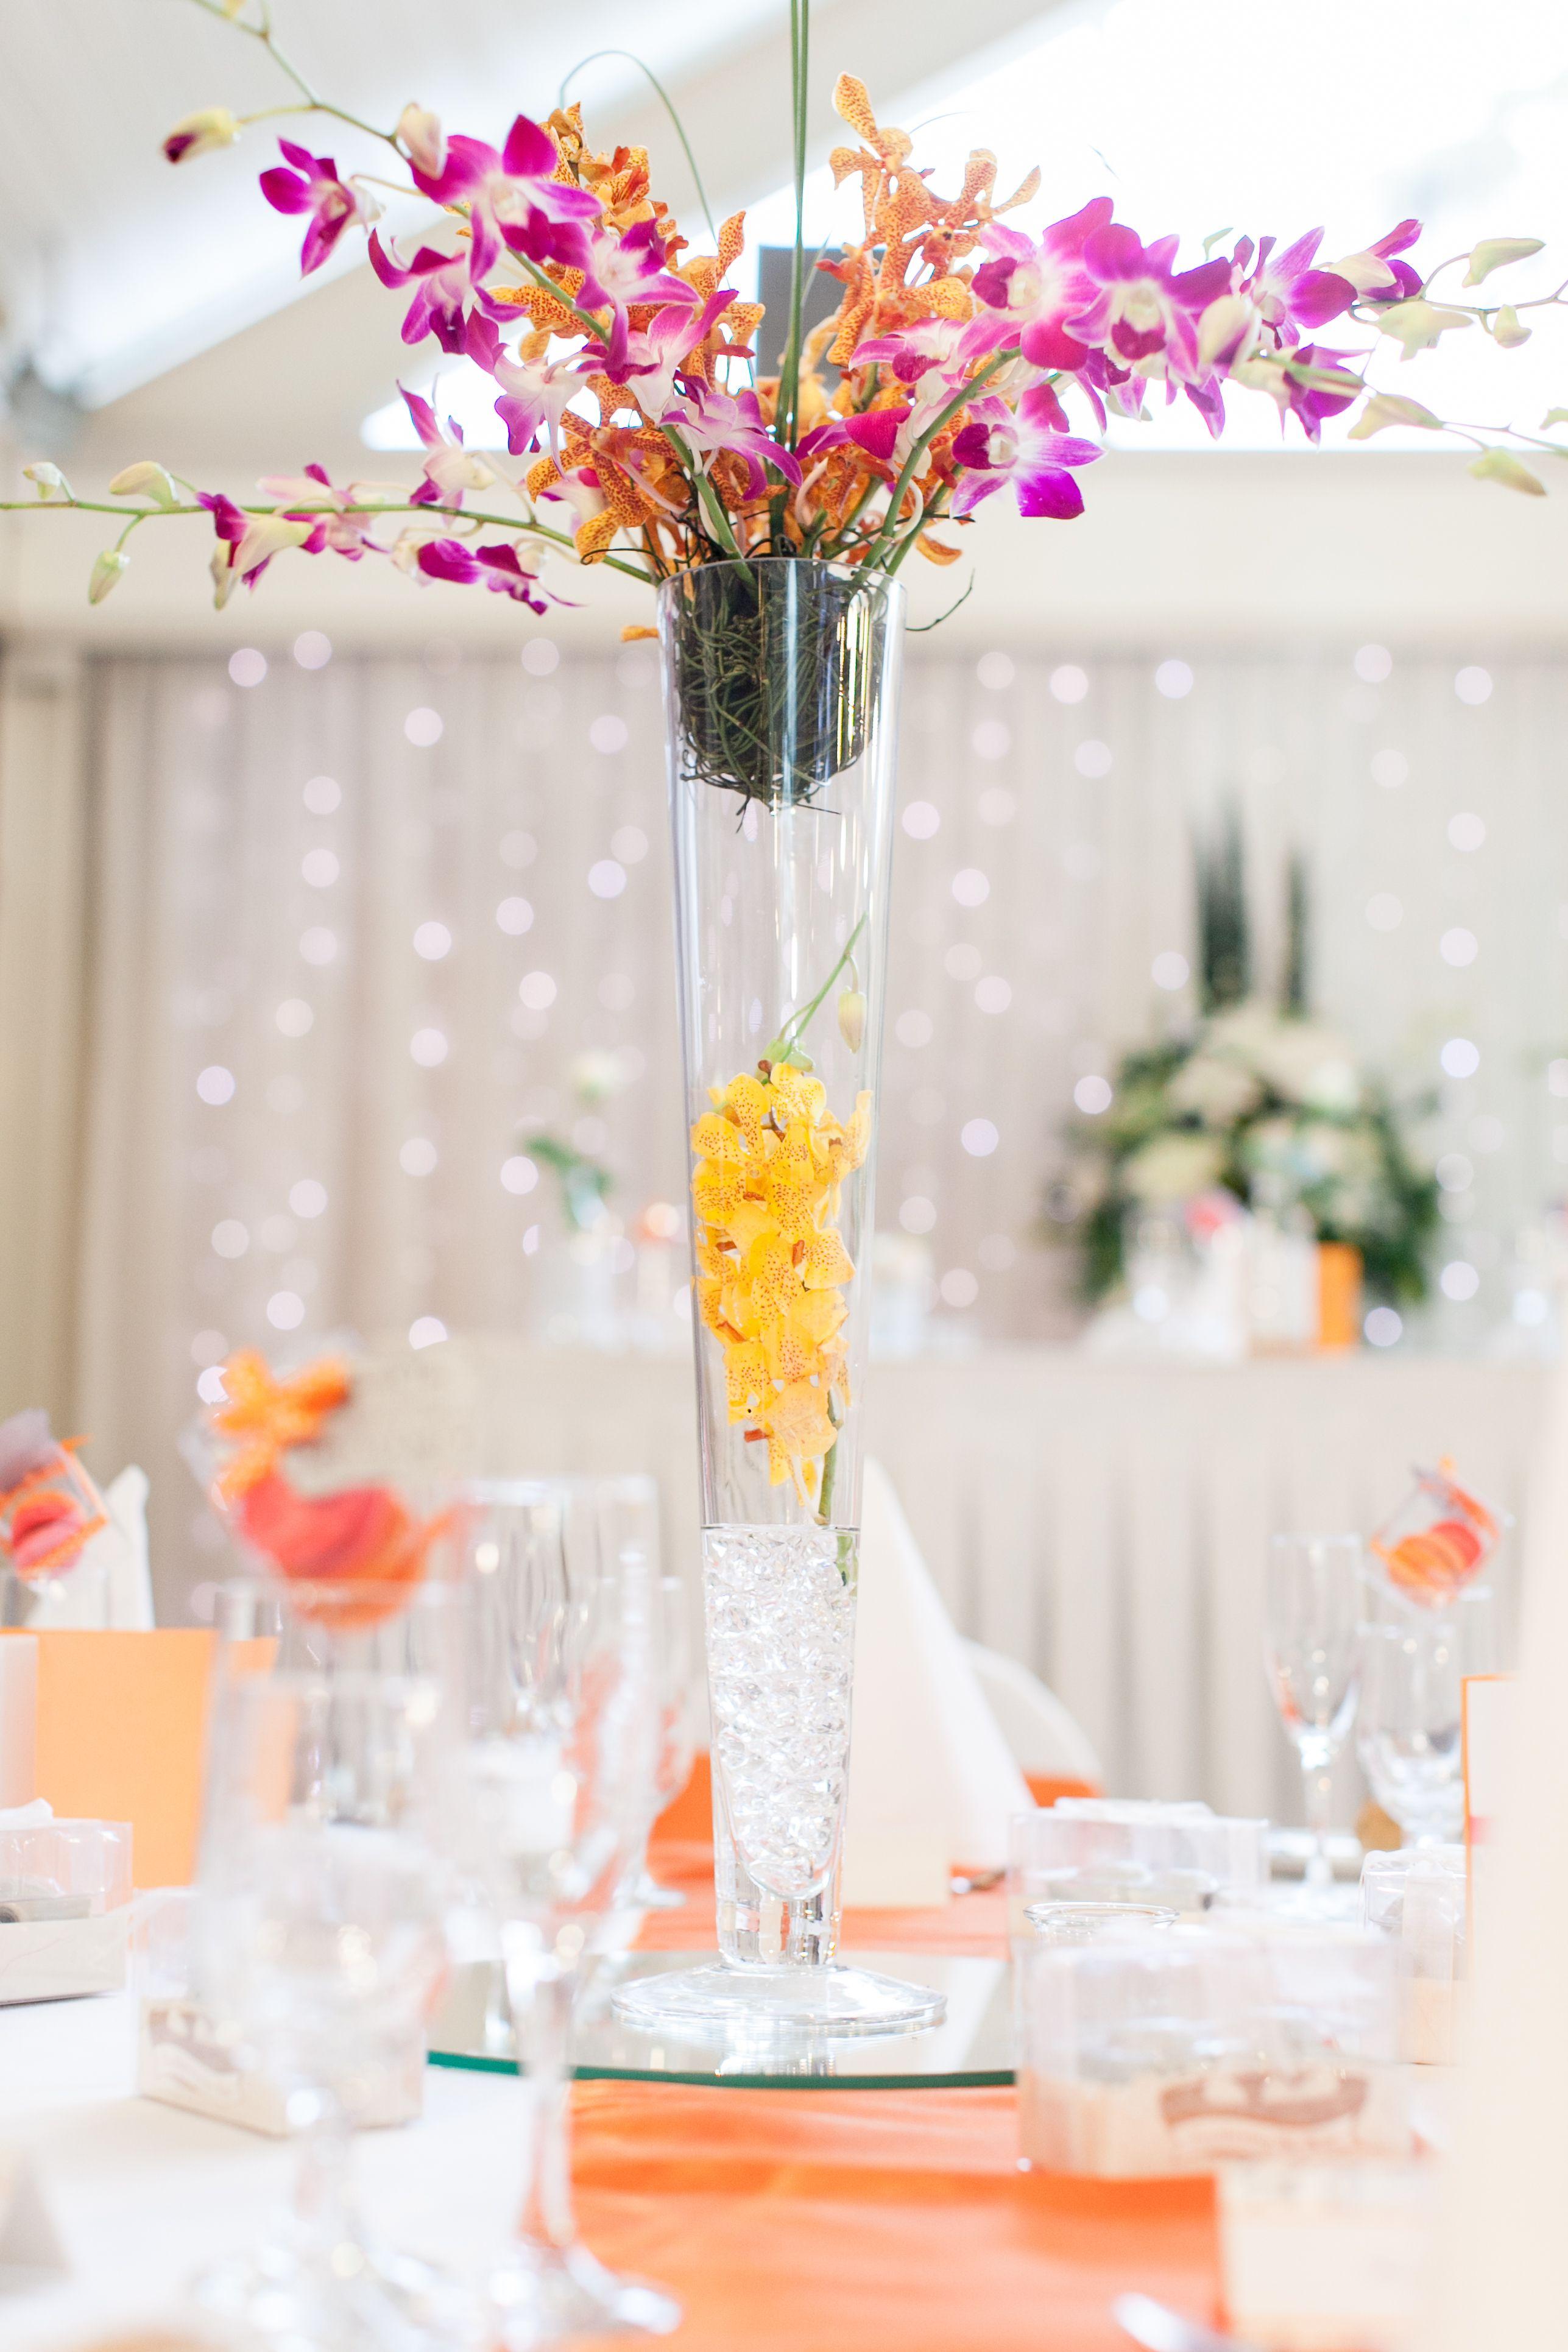 Theme: Orange and Pink Wedding Table Centrepiece flower vase ...